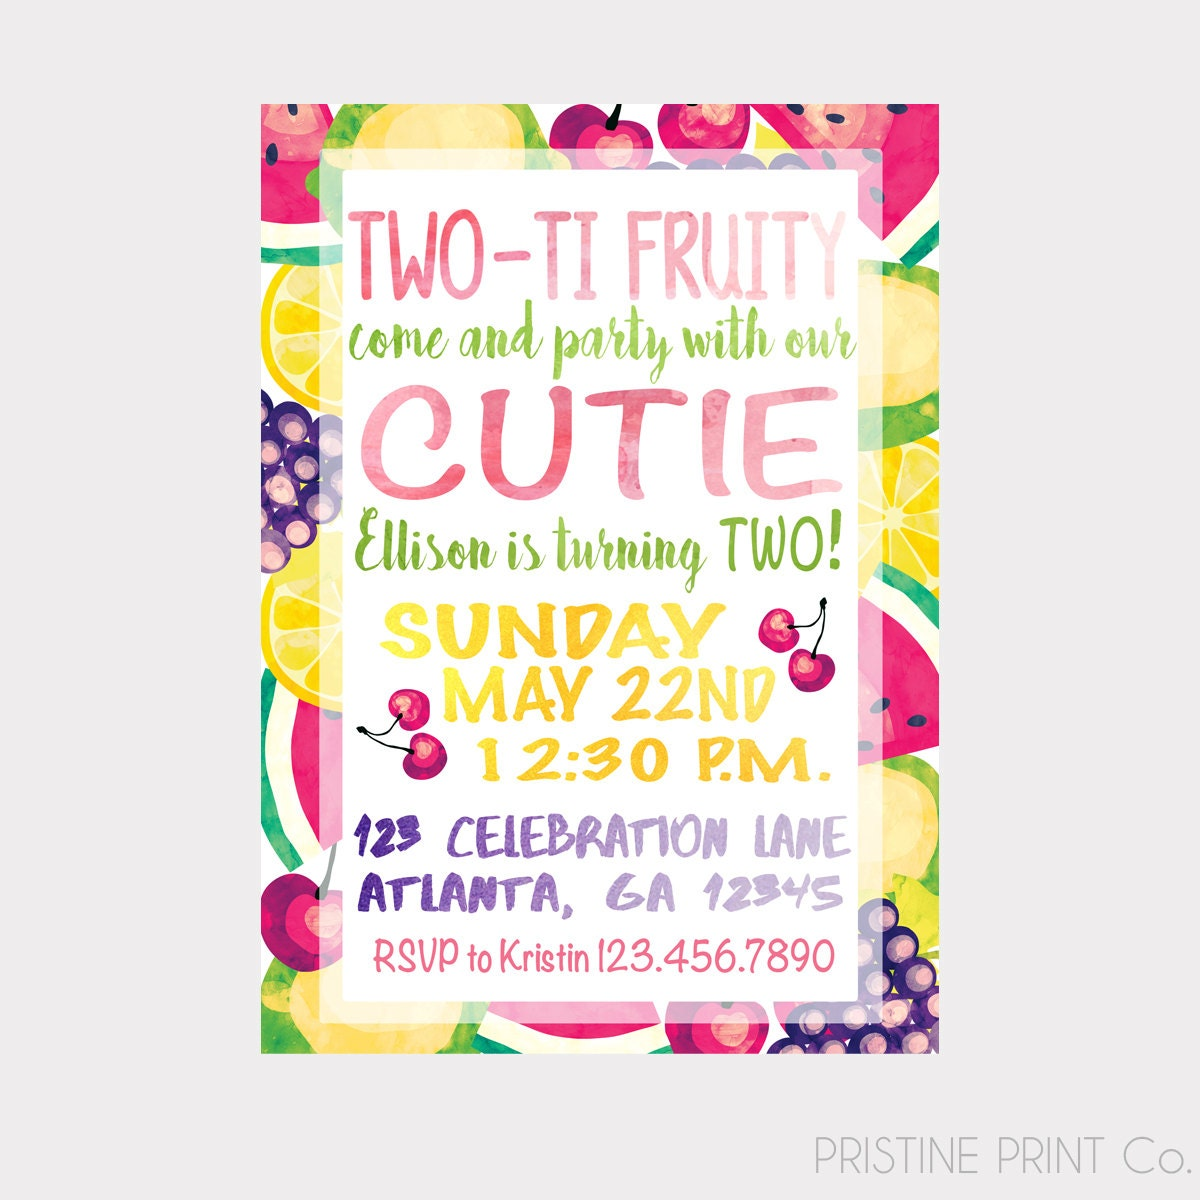 TWO TI FRUITY Tutti Frutti Fruit Birthday Invitation By